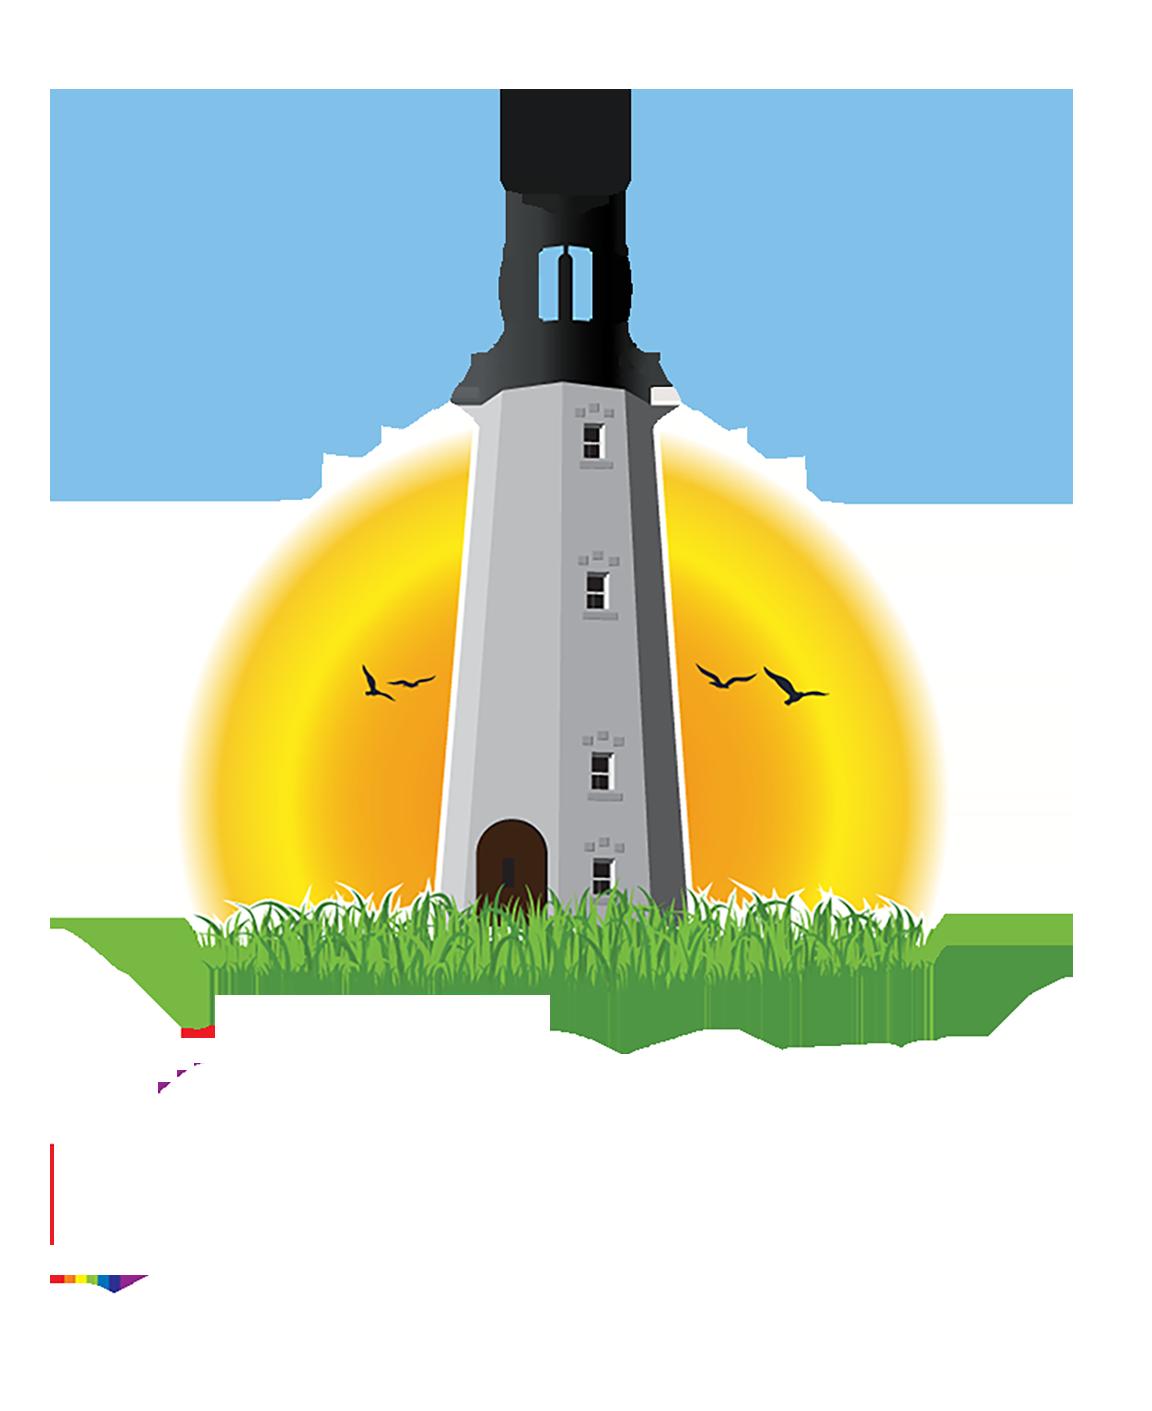 boardwalkradio.com